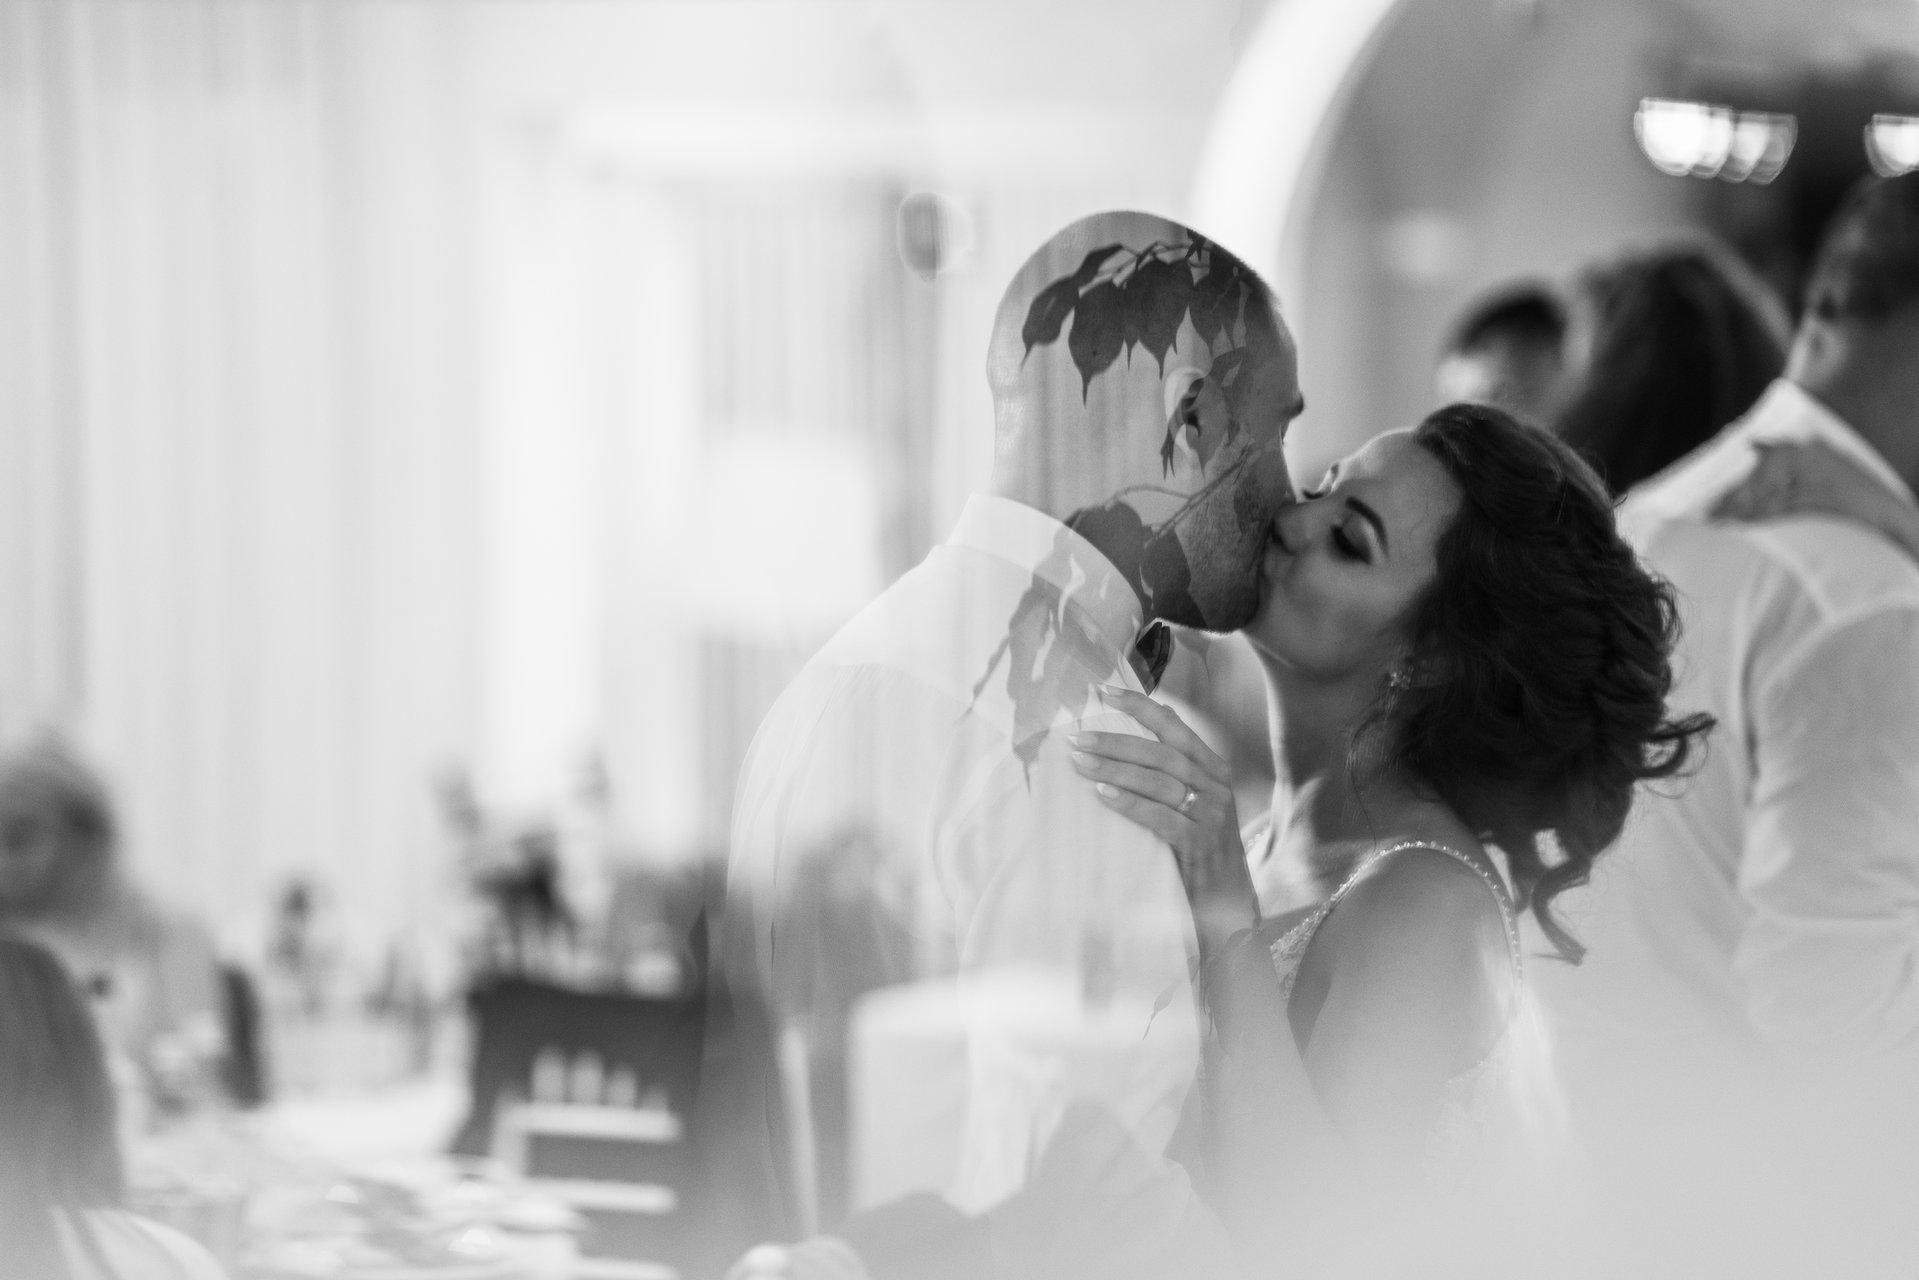 Сватбени отражения | Author Zahari Minchev - Zaxo | PHOTO FORUM